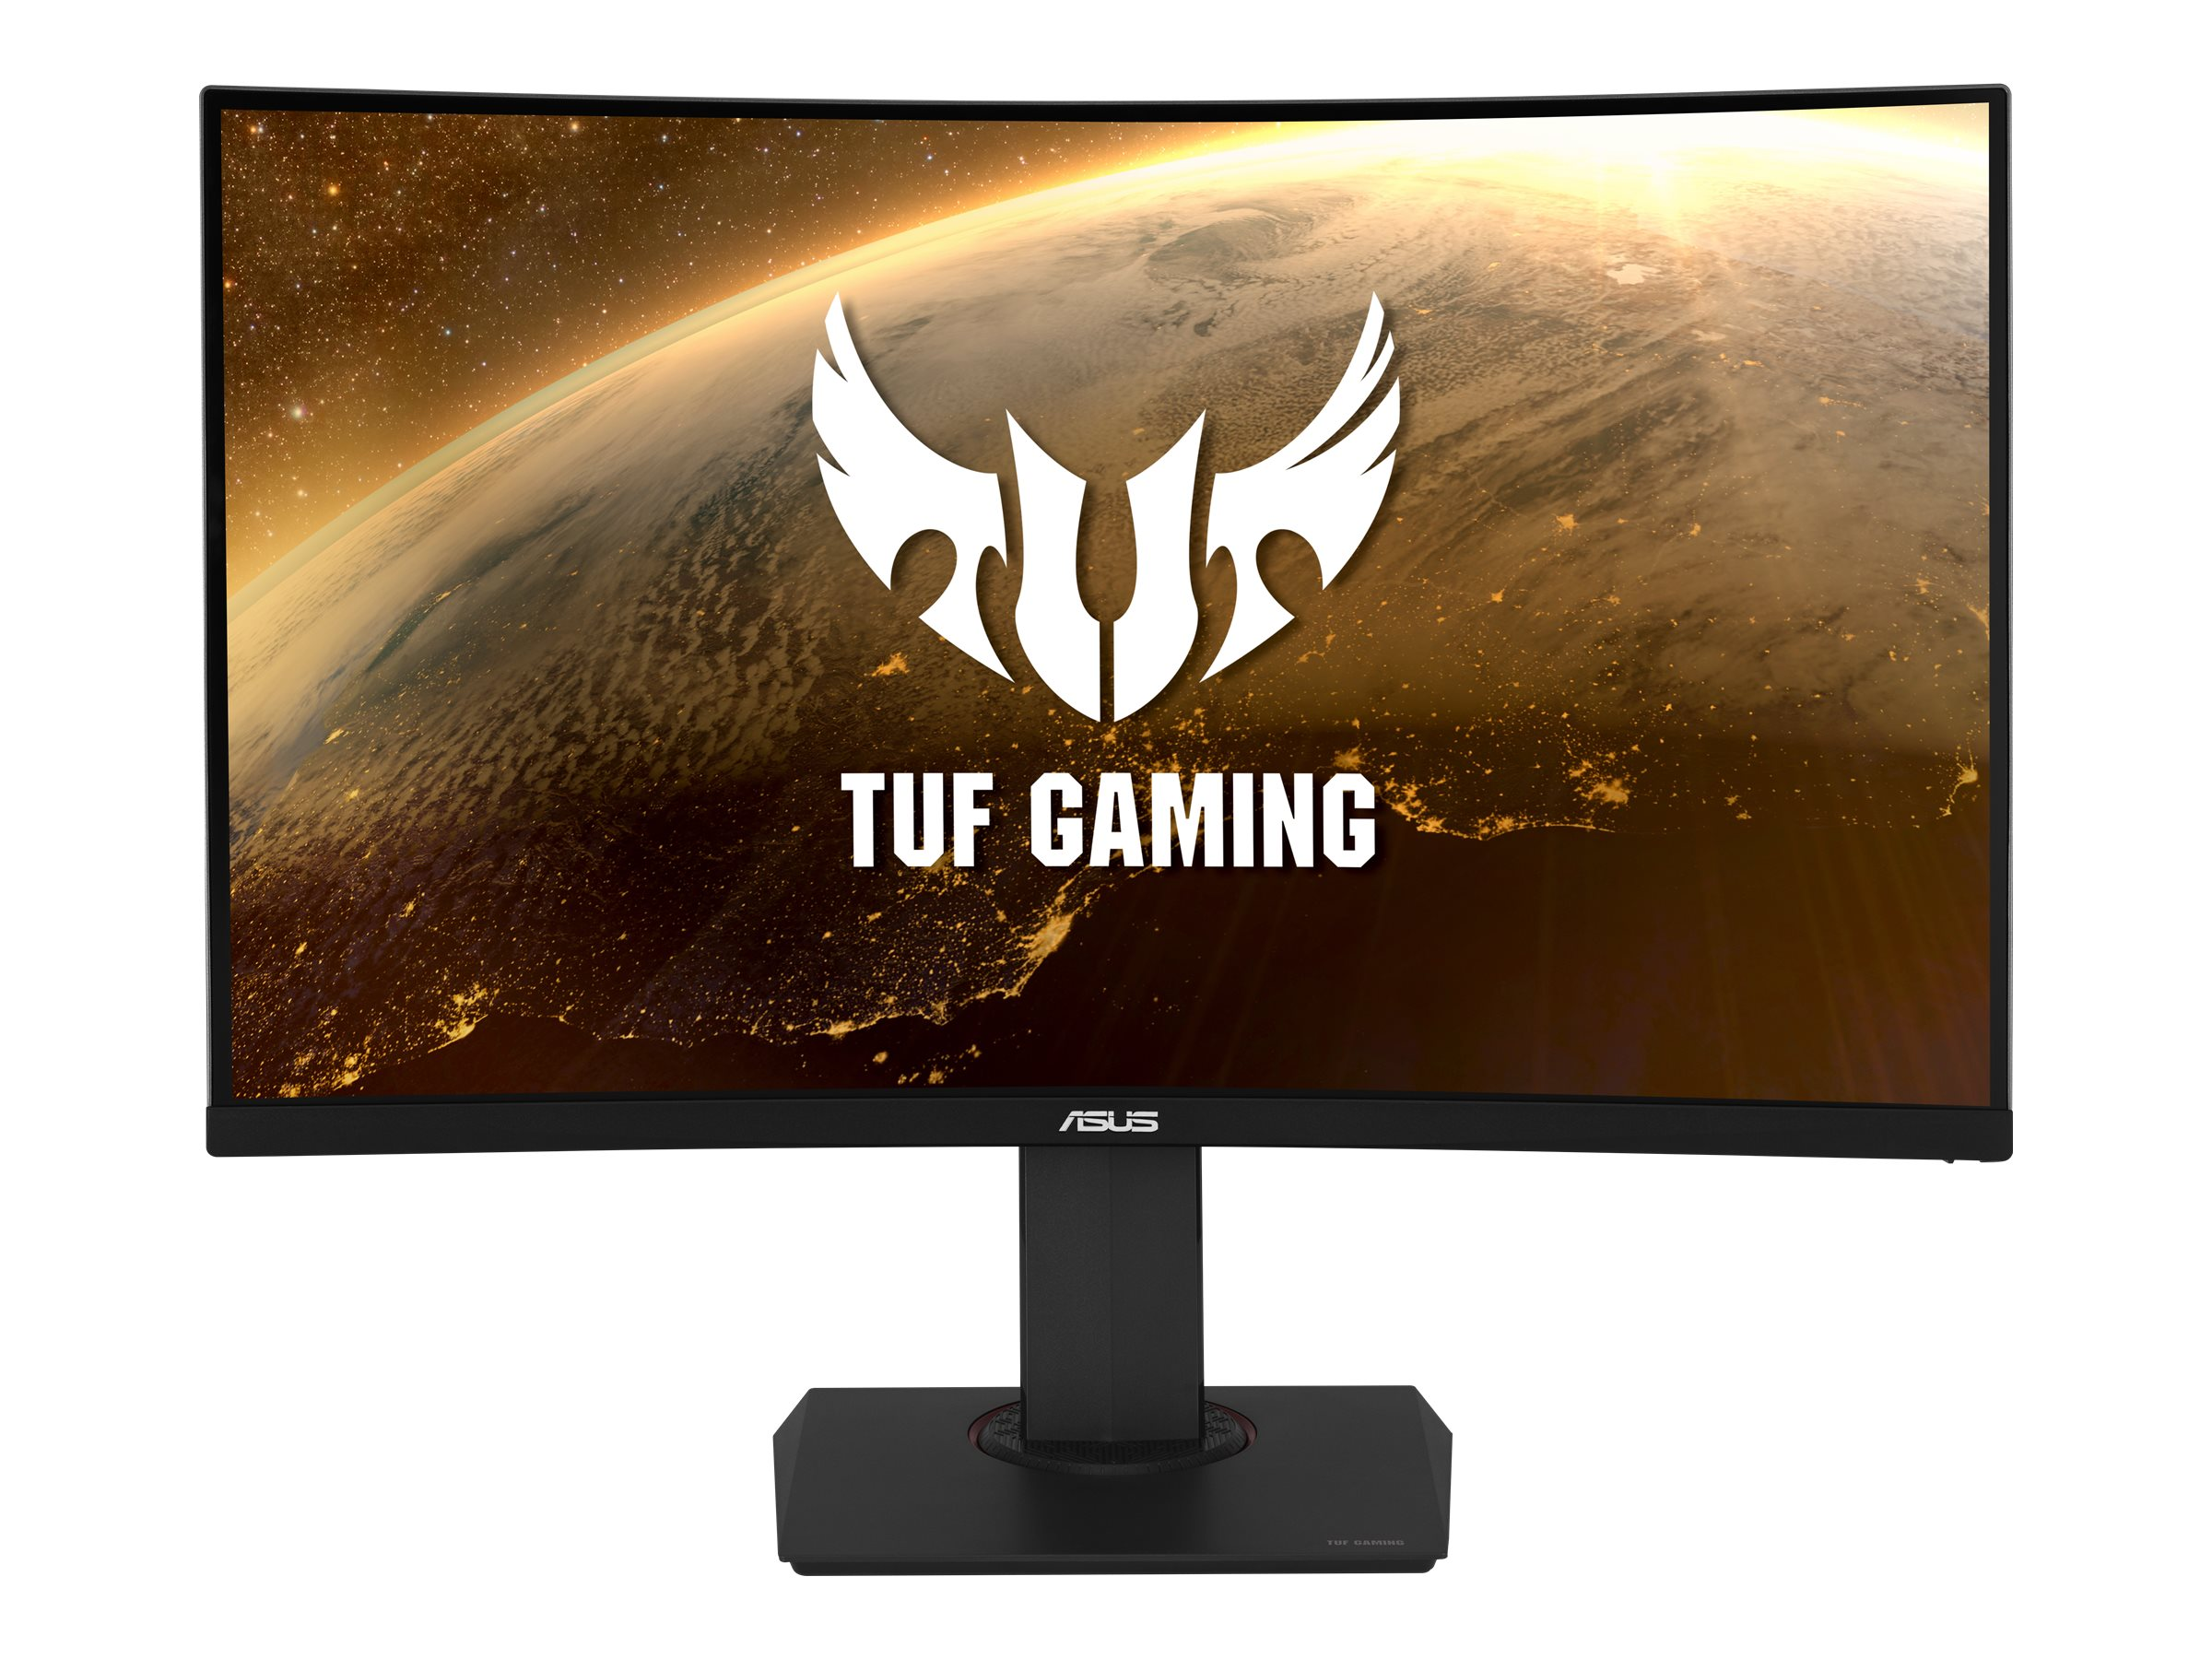 "Vorschau: ASUS TUF Gaming VG32VQ - LED-Monitor - gebogen - 80.1 cm (31.5"")"